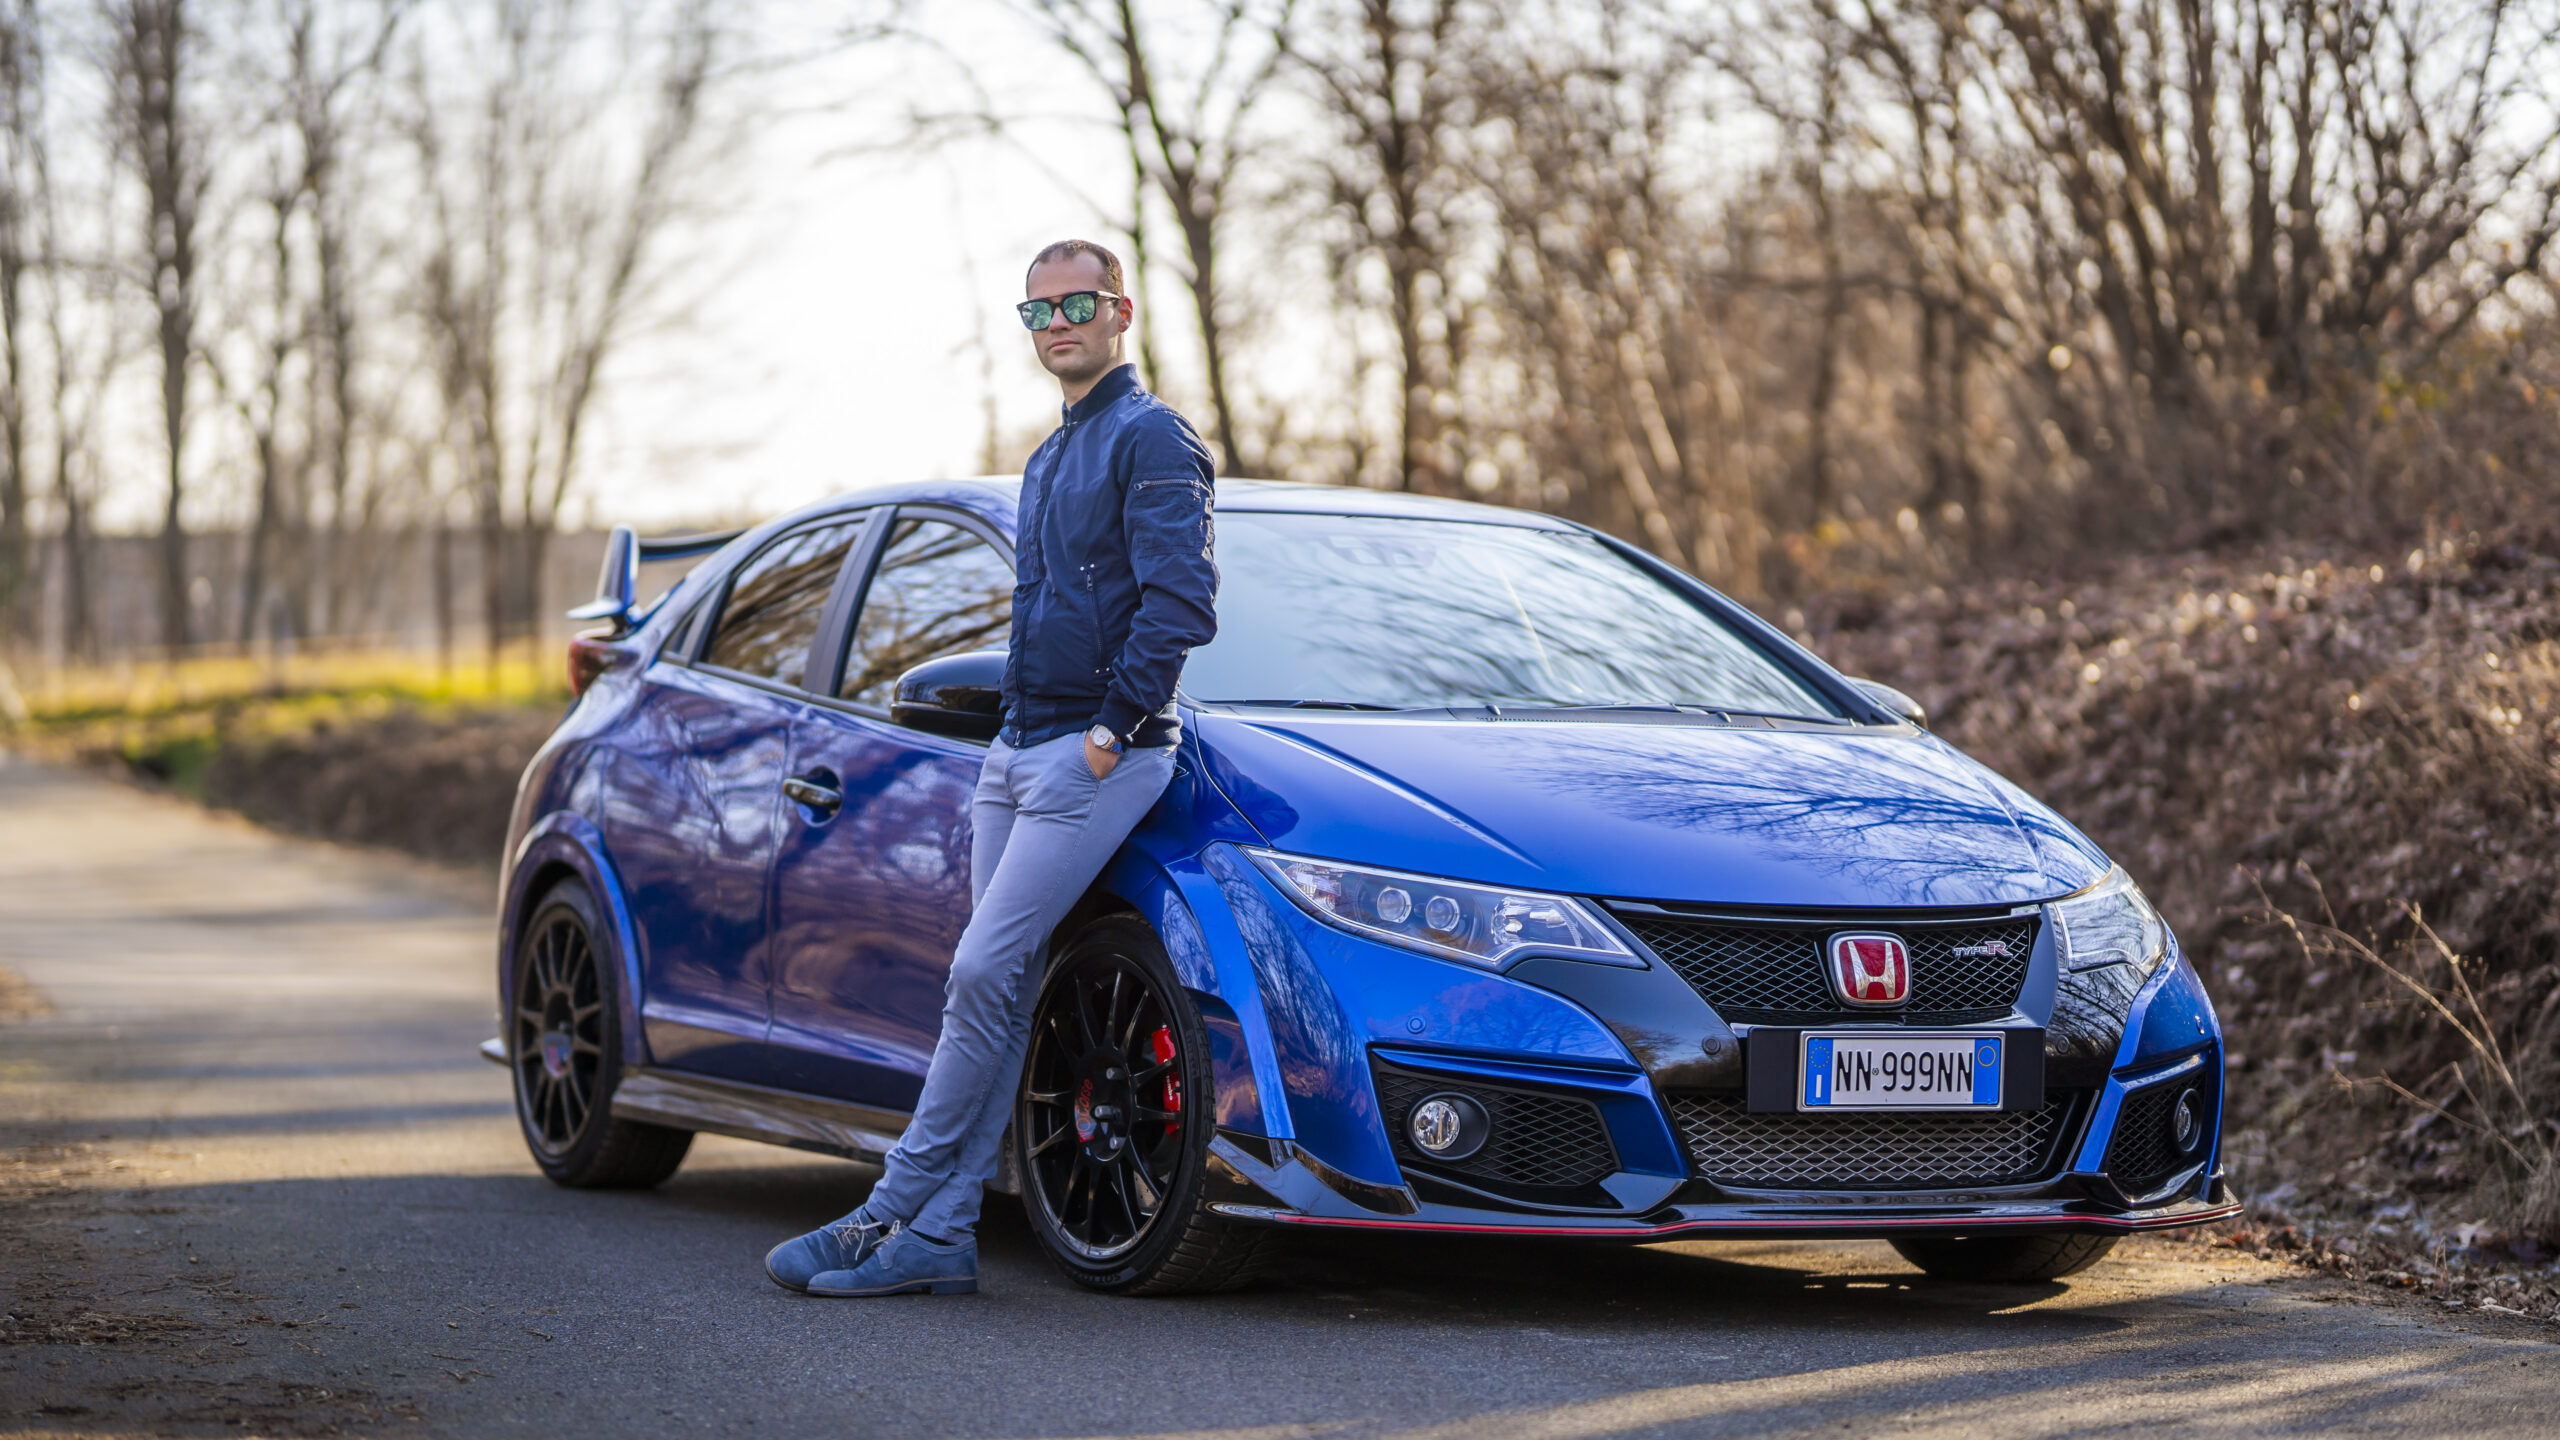 Prova su strada: Honda Civic Type R FK2